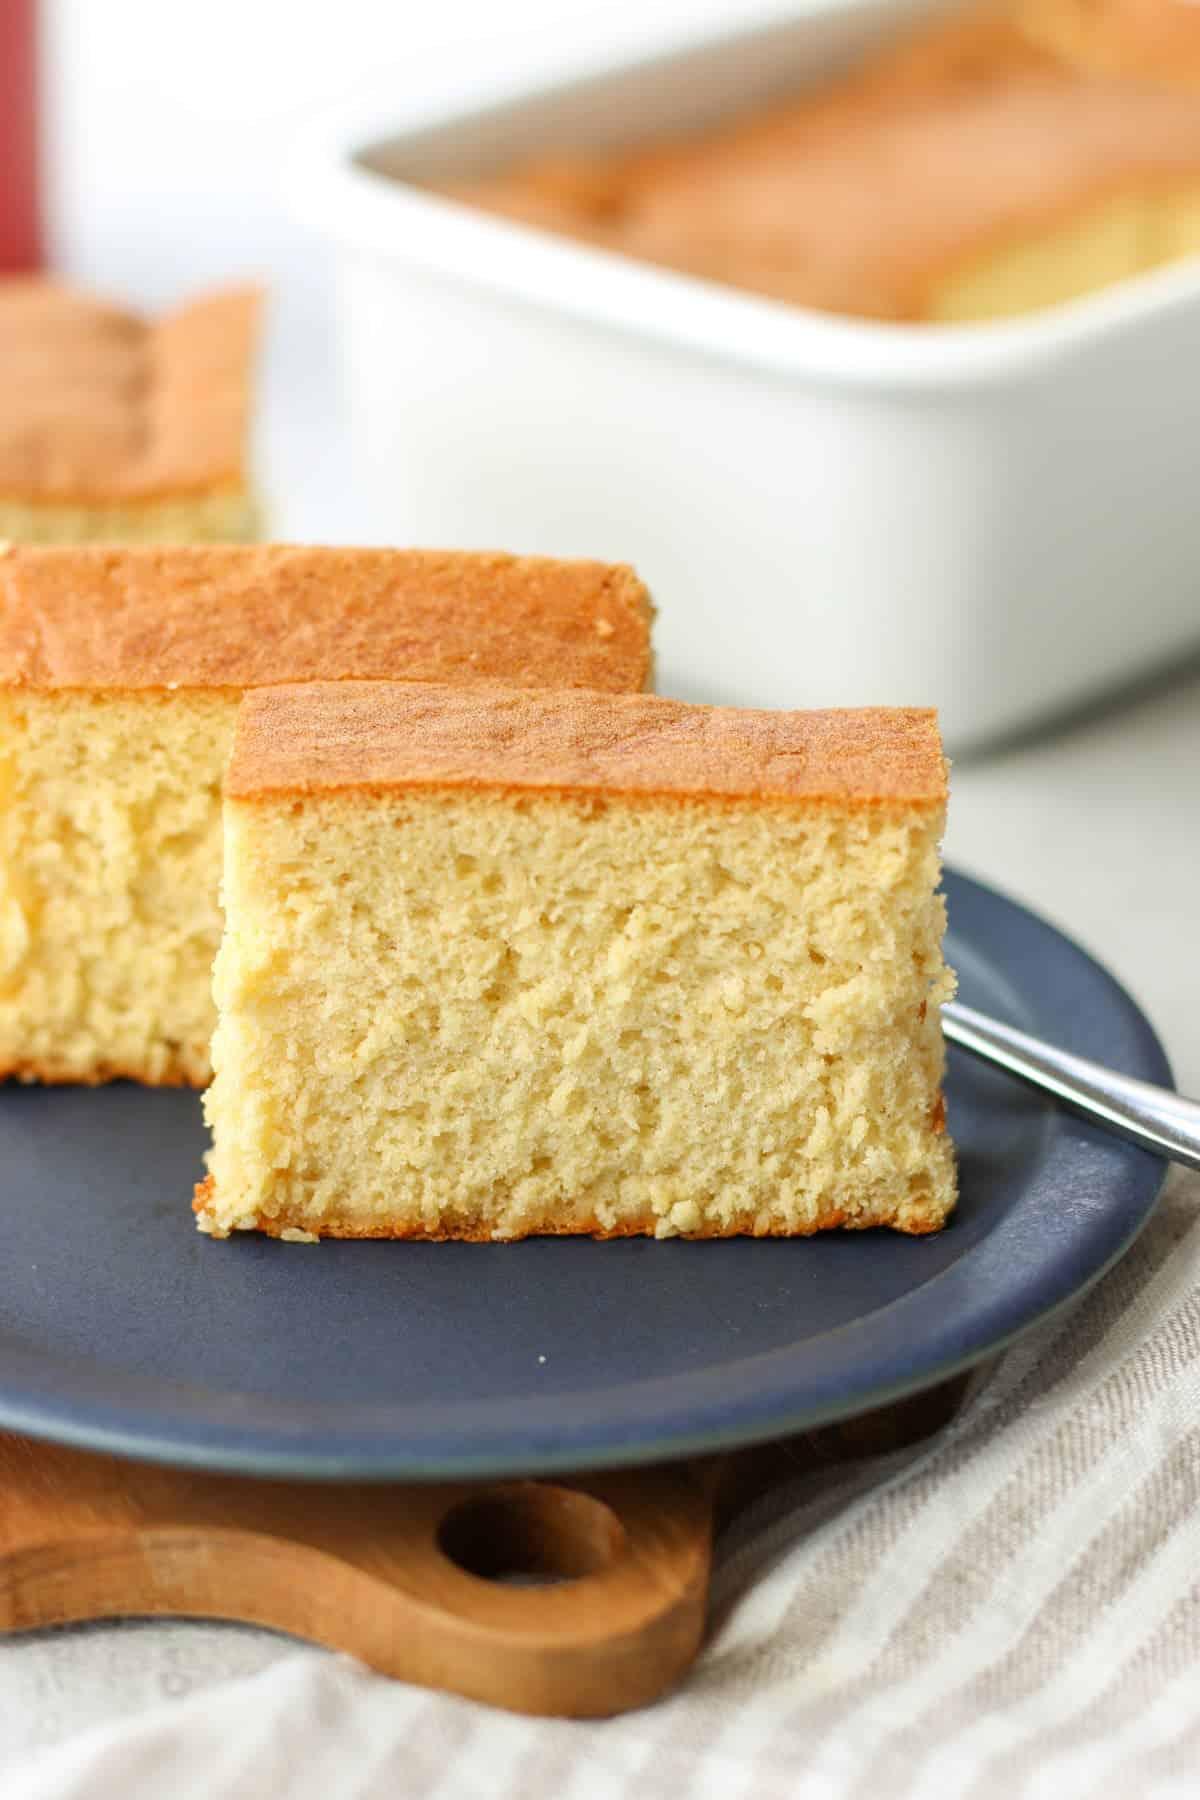 2 slices of Japanese castella cake on a dessert plate